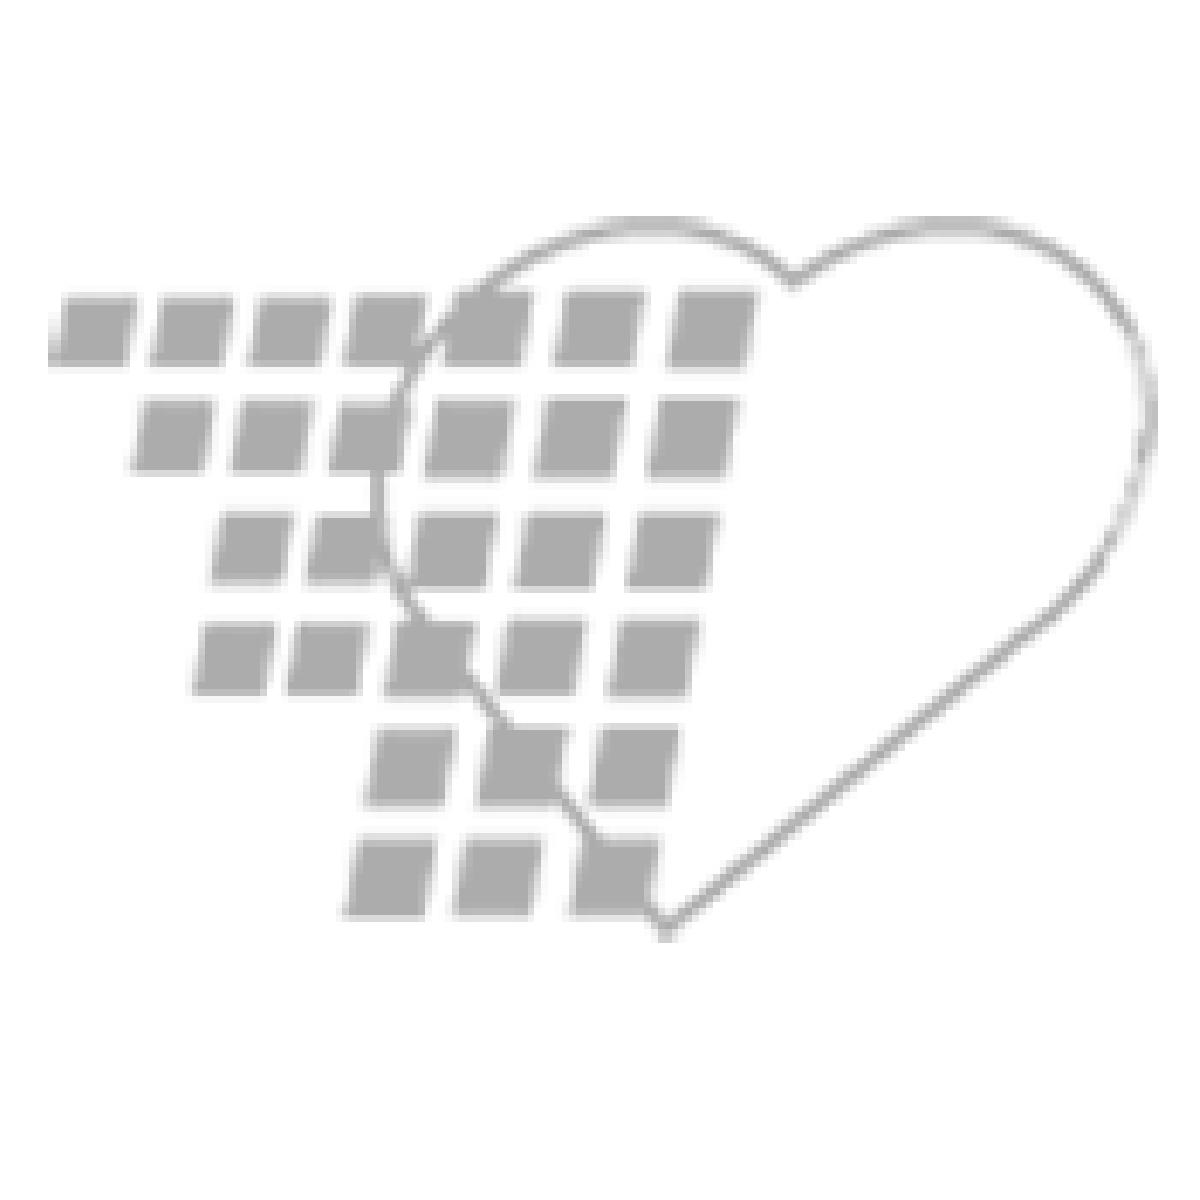 07-26-4114 - BD® Cardinal Rigid Basin Kits with Saline - 14 Fr